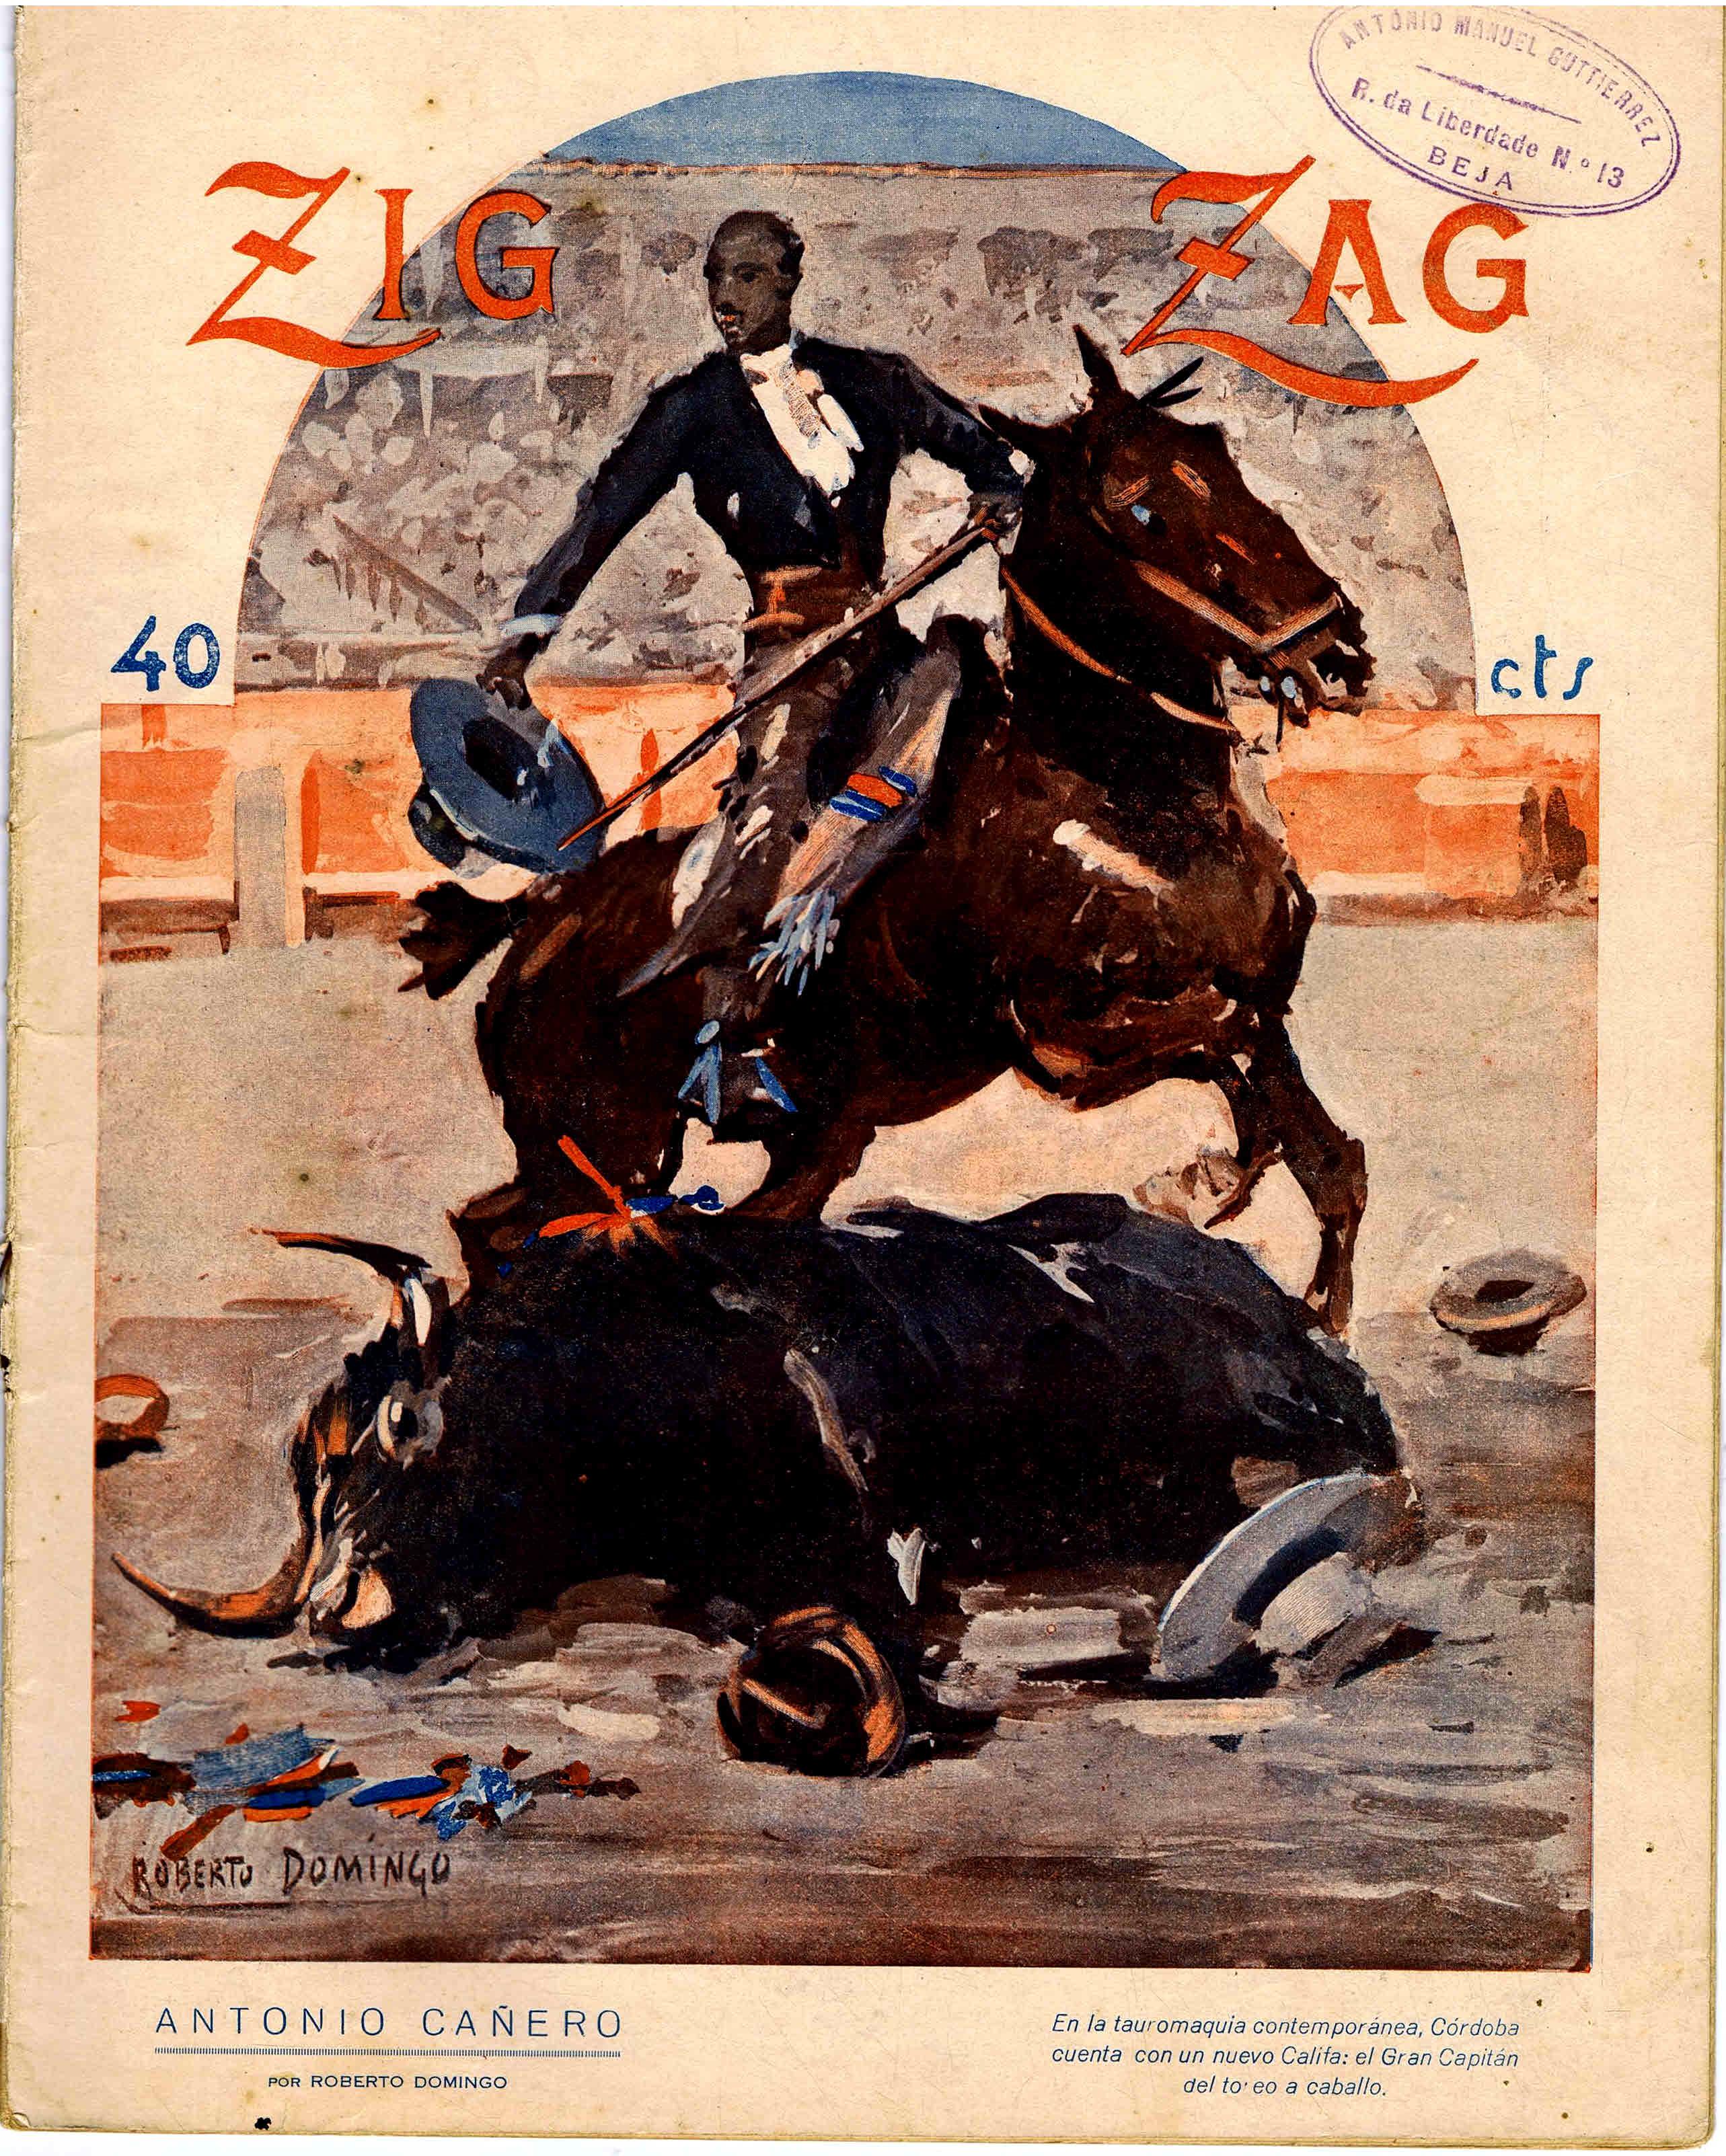 zig zag 24 05 1924